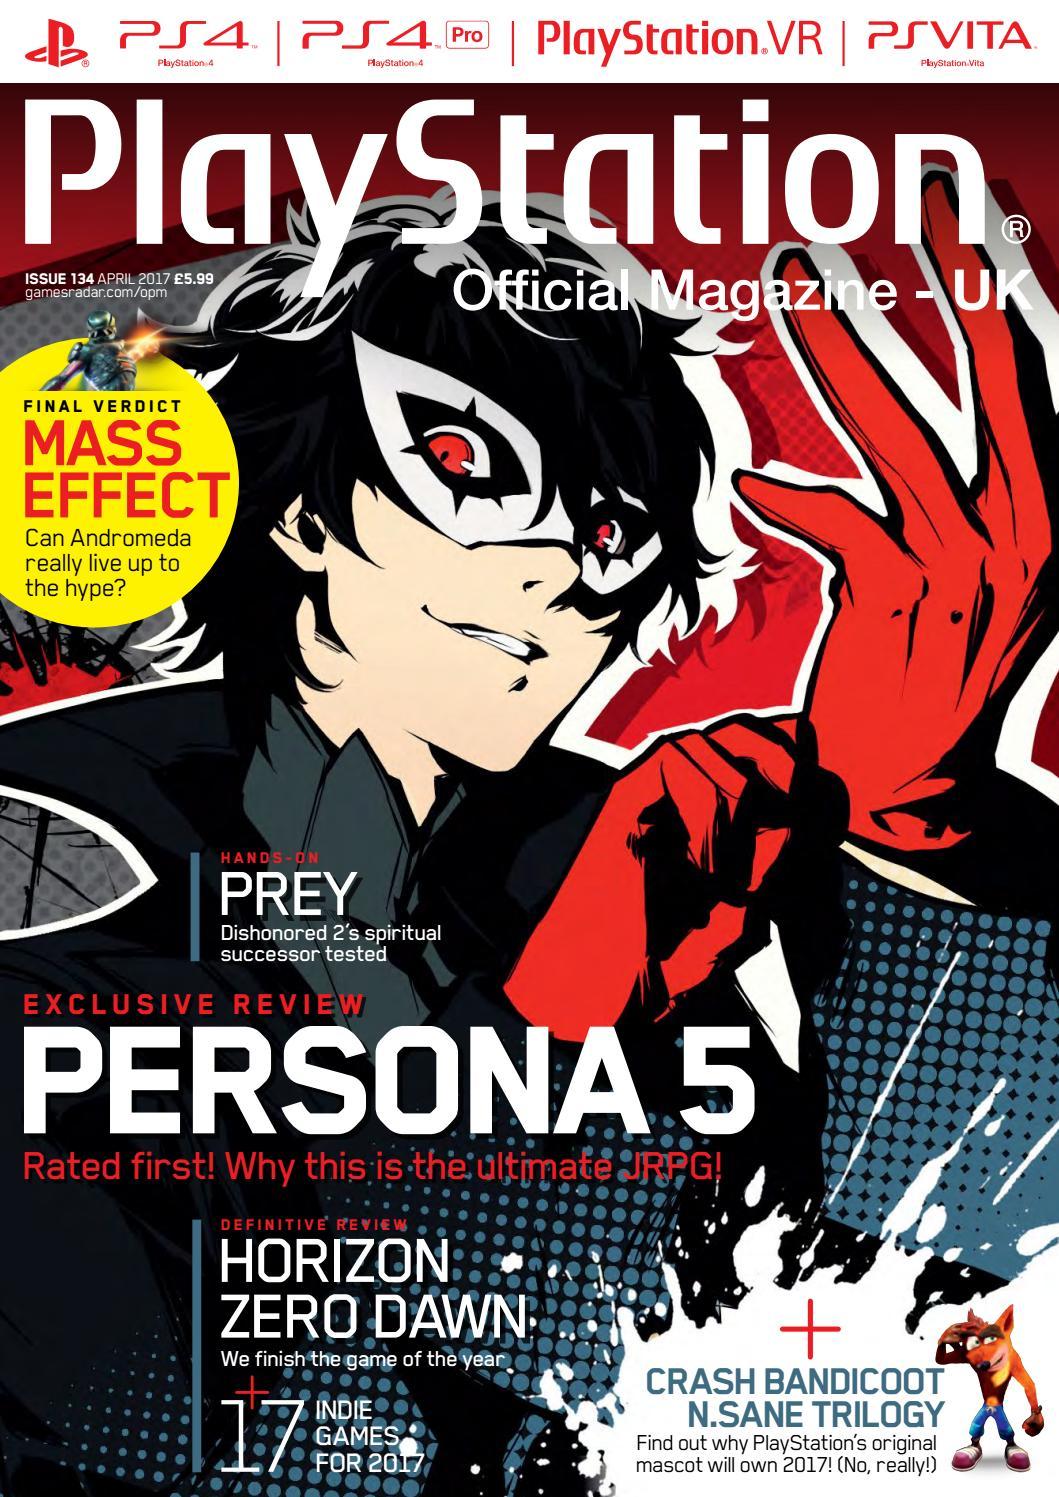 Horizon Zero Dawn Poster PS4 Exclusive Design High Quality Prints